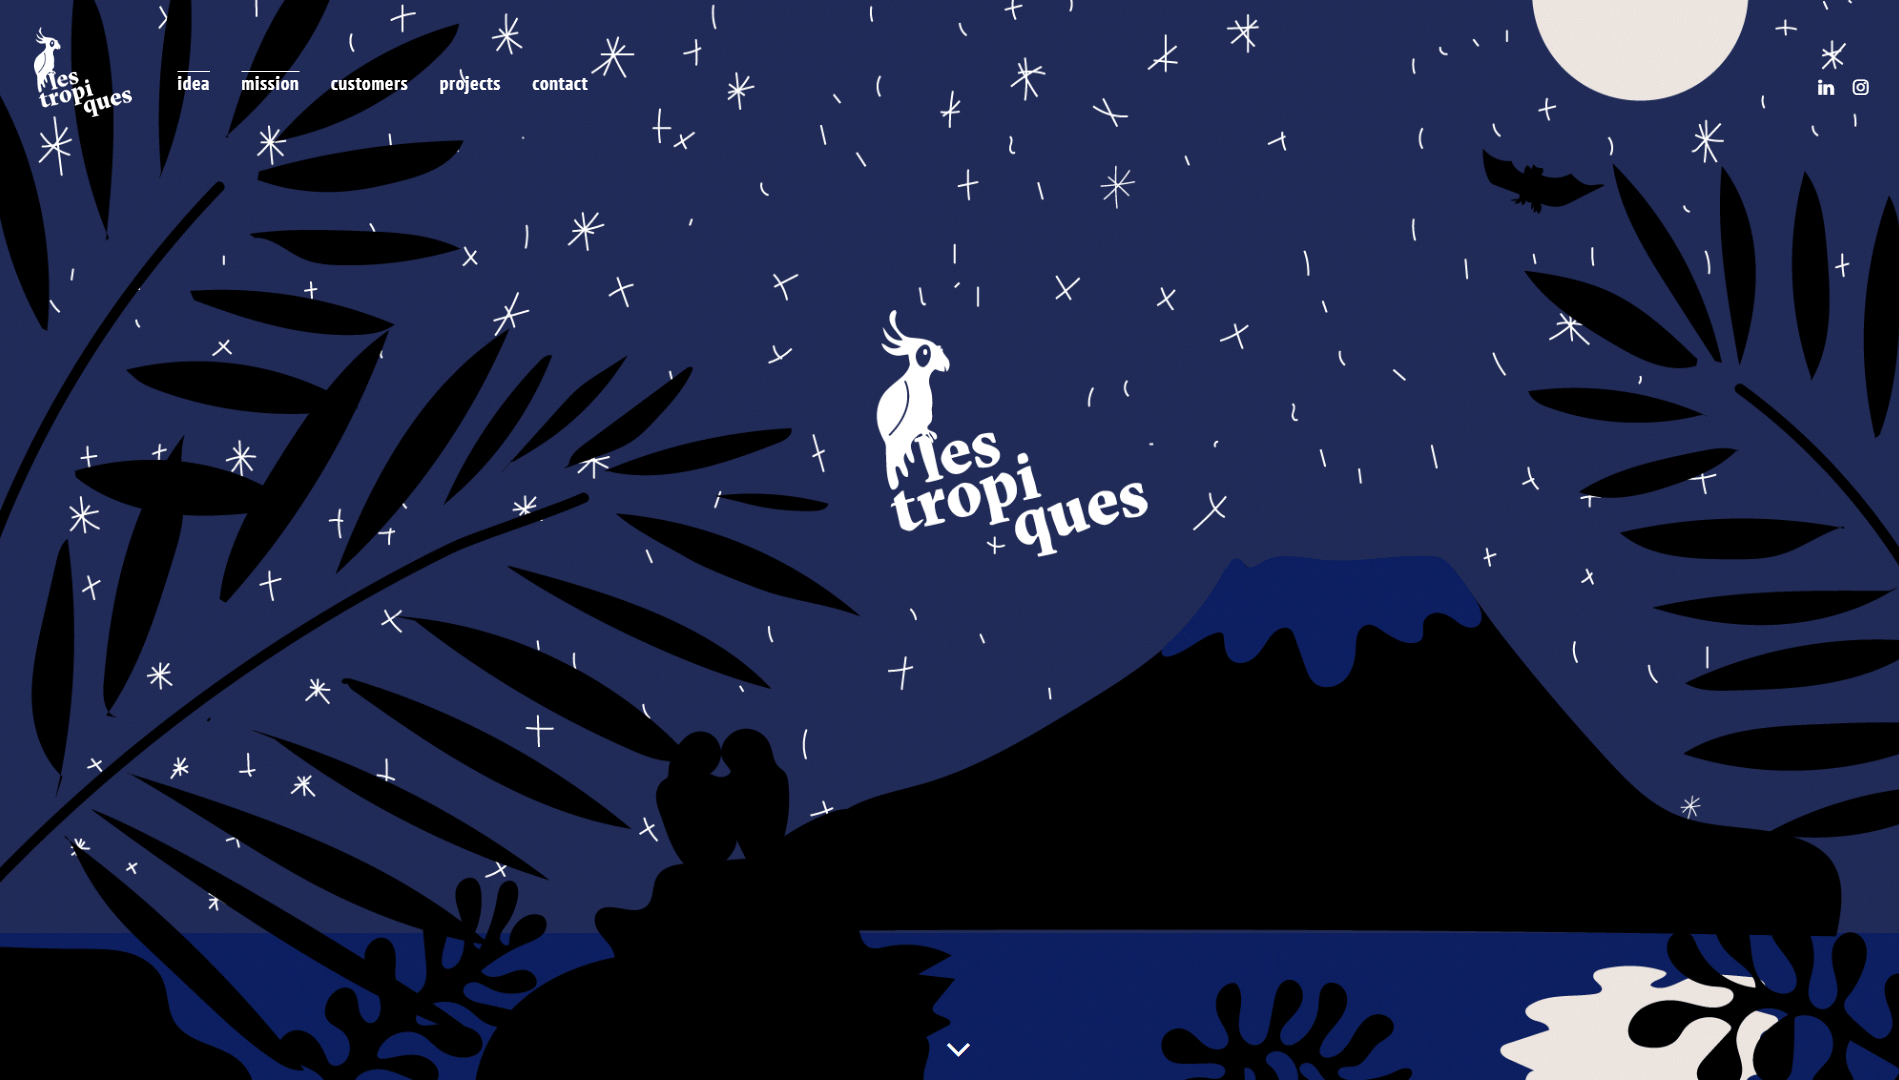 The Les Tropiques homepage.